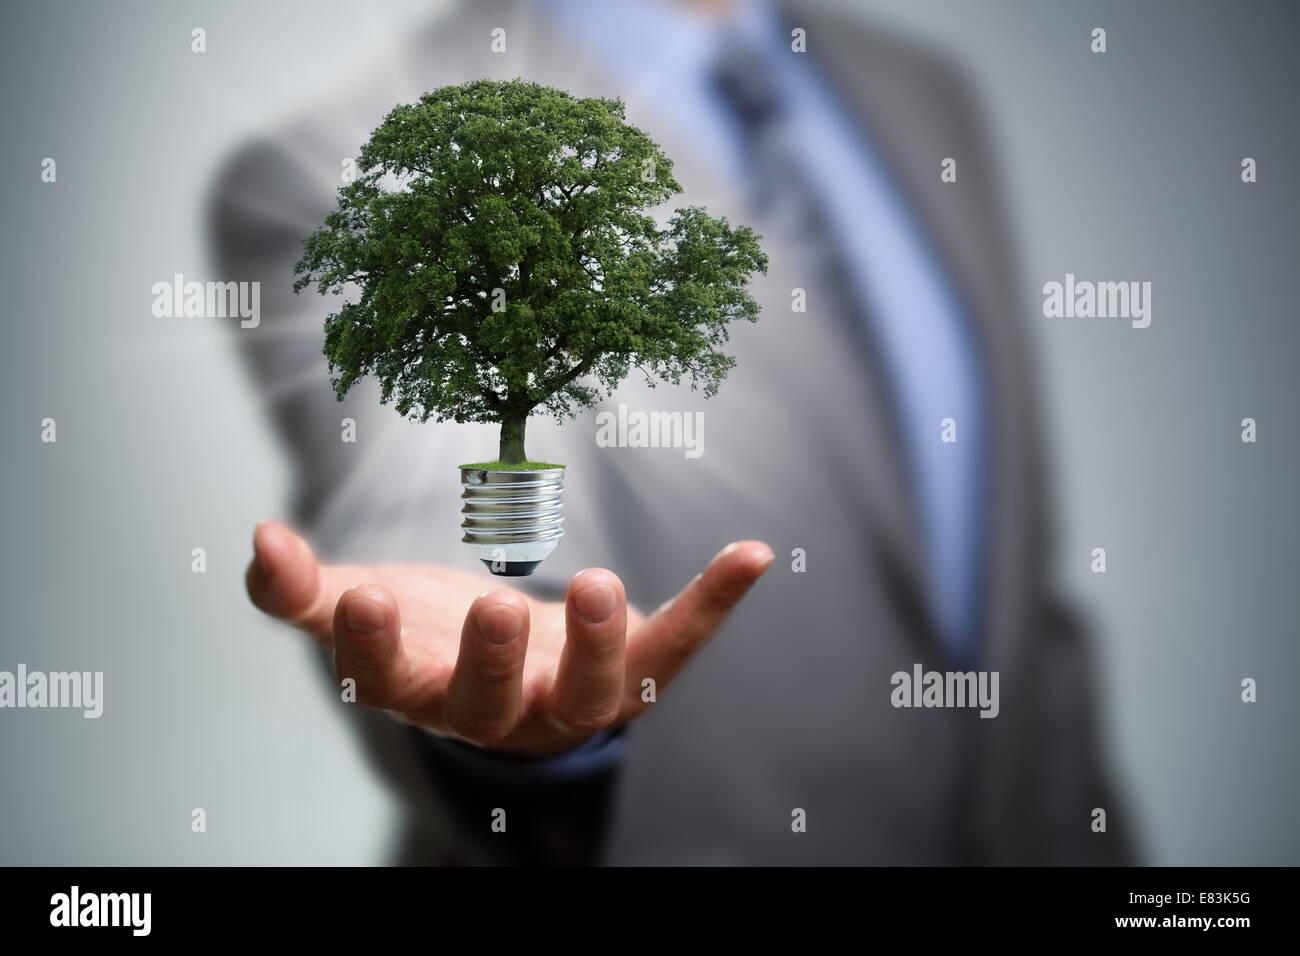 Energía limpia Imagen De Stock